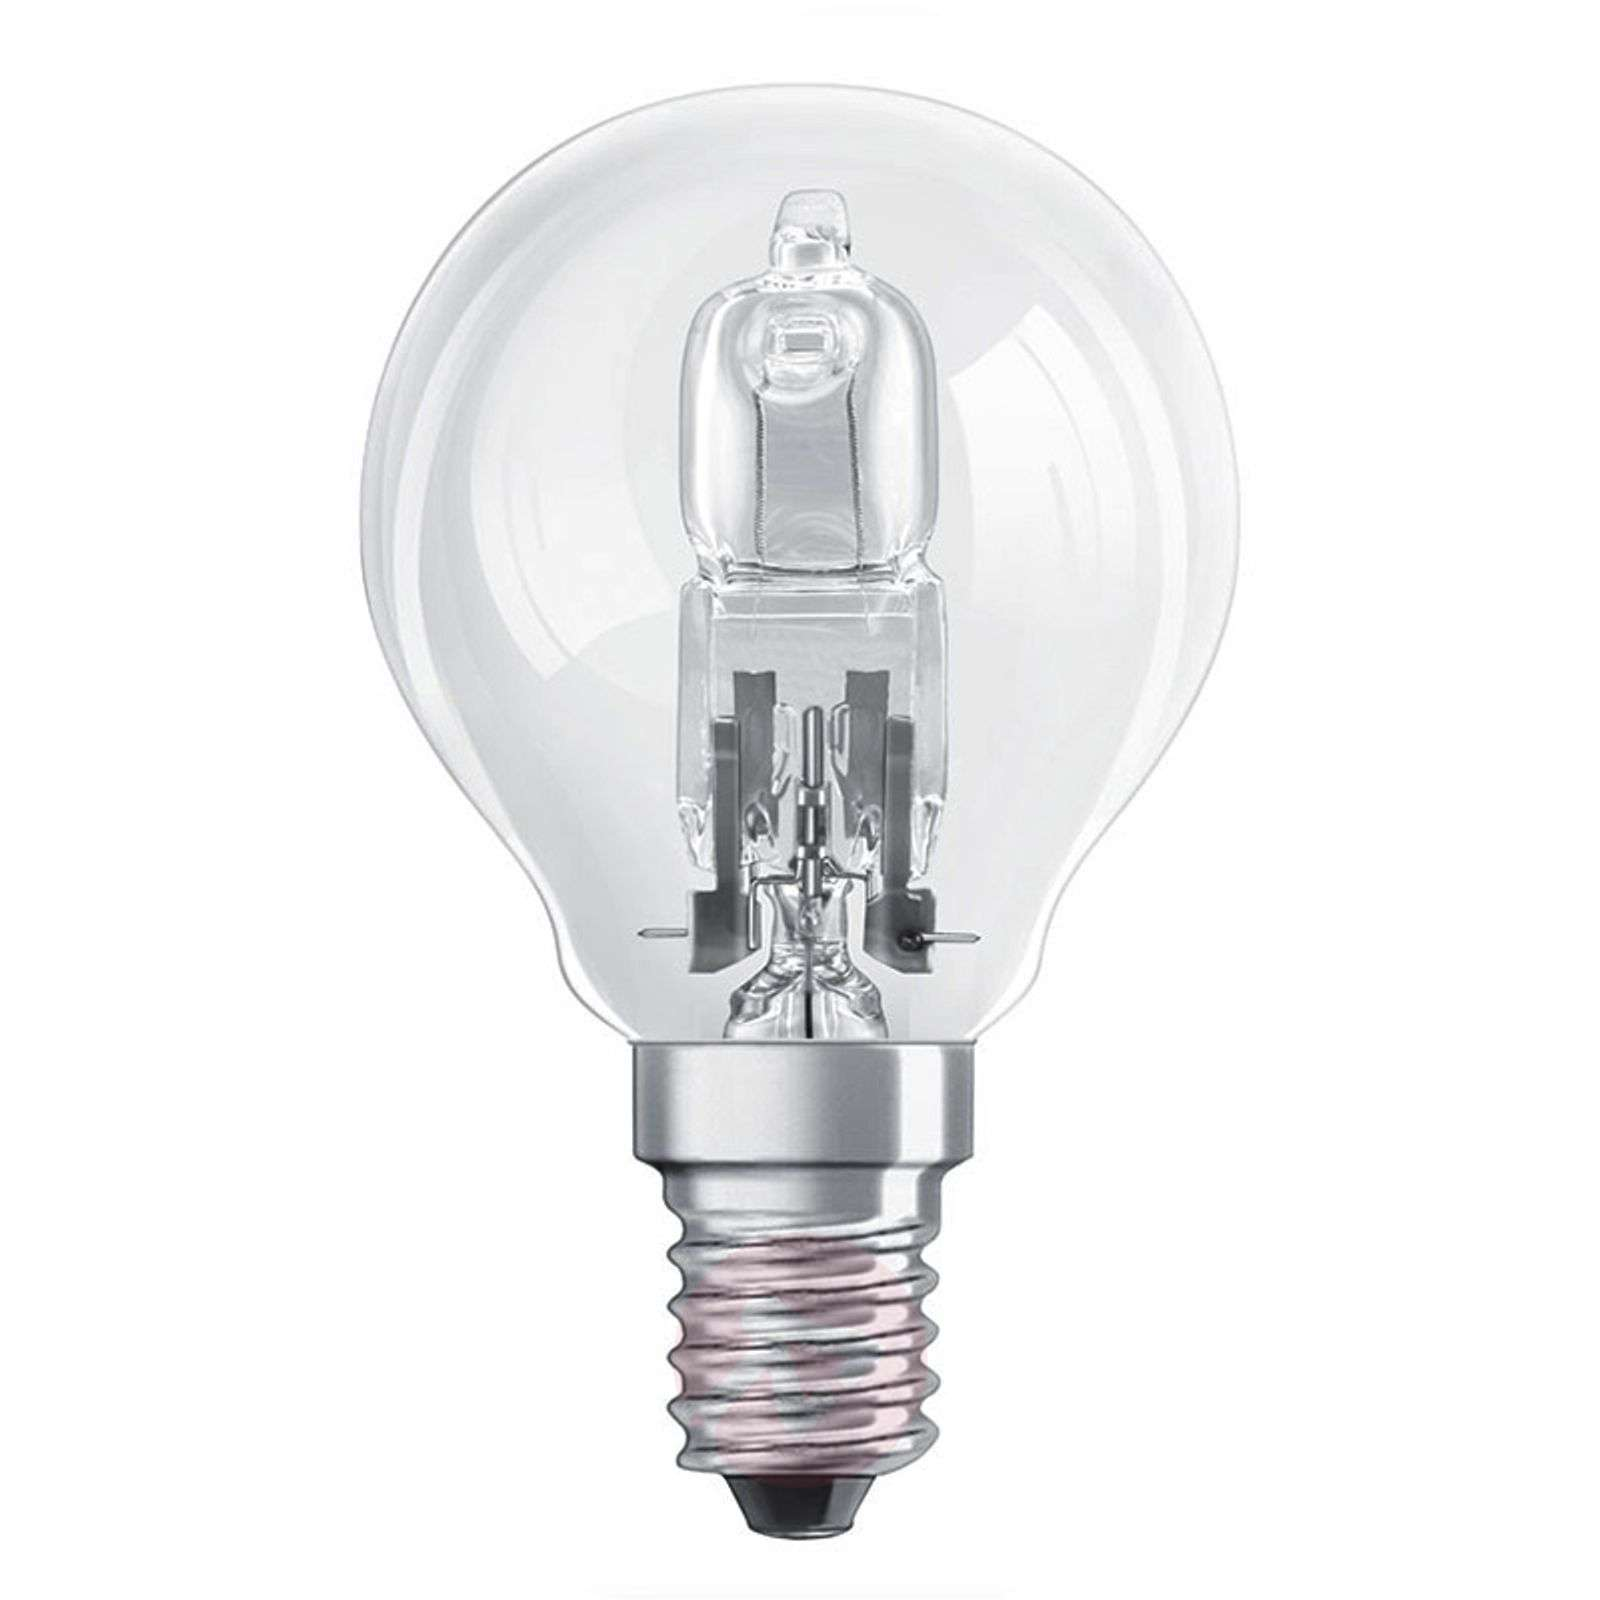 E14 tear bulb Halogen CLASSIC P-7260214X-01